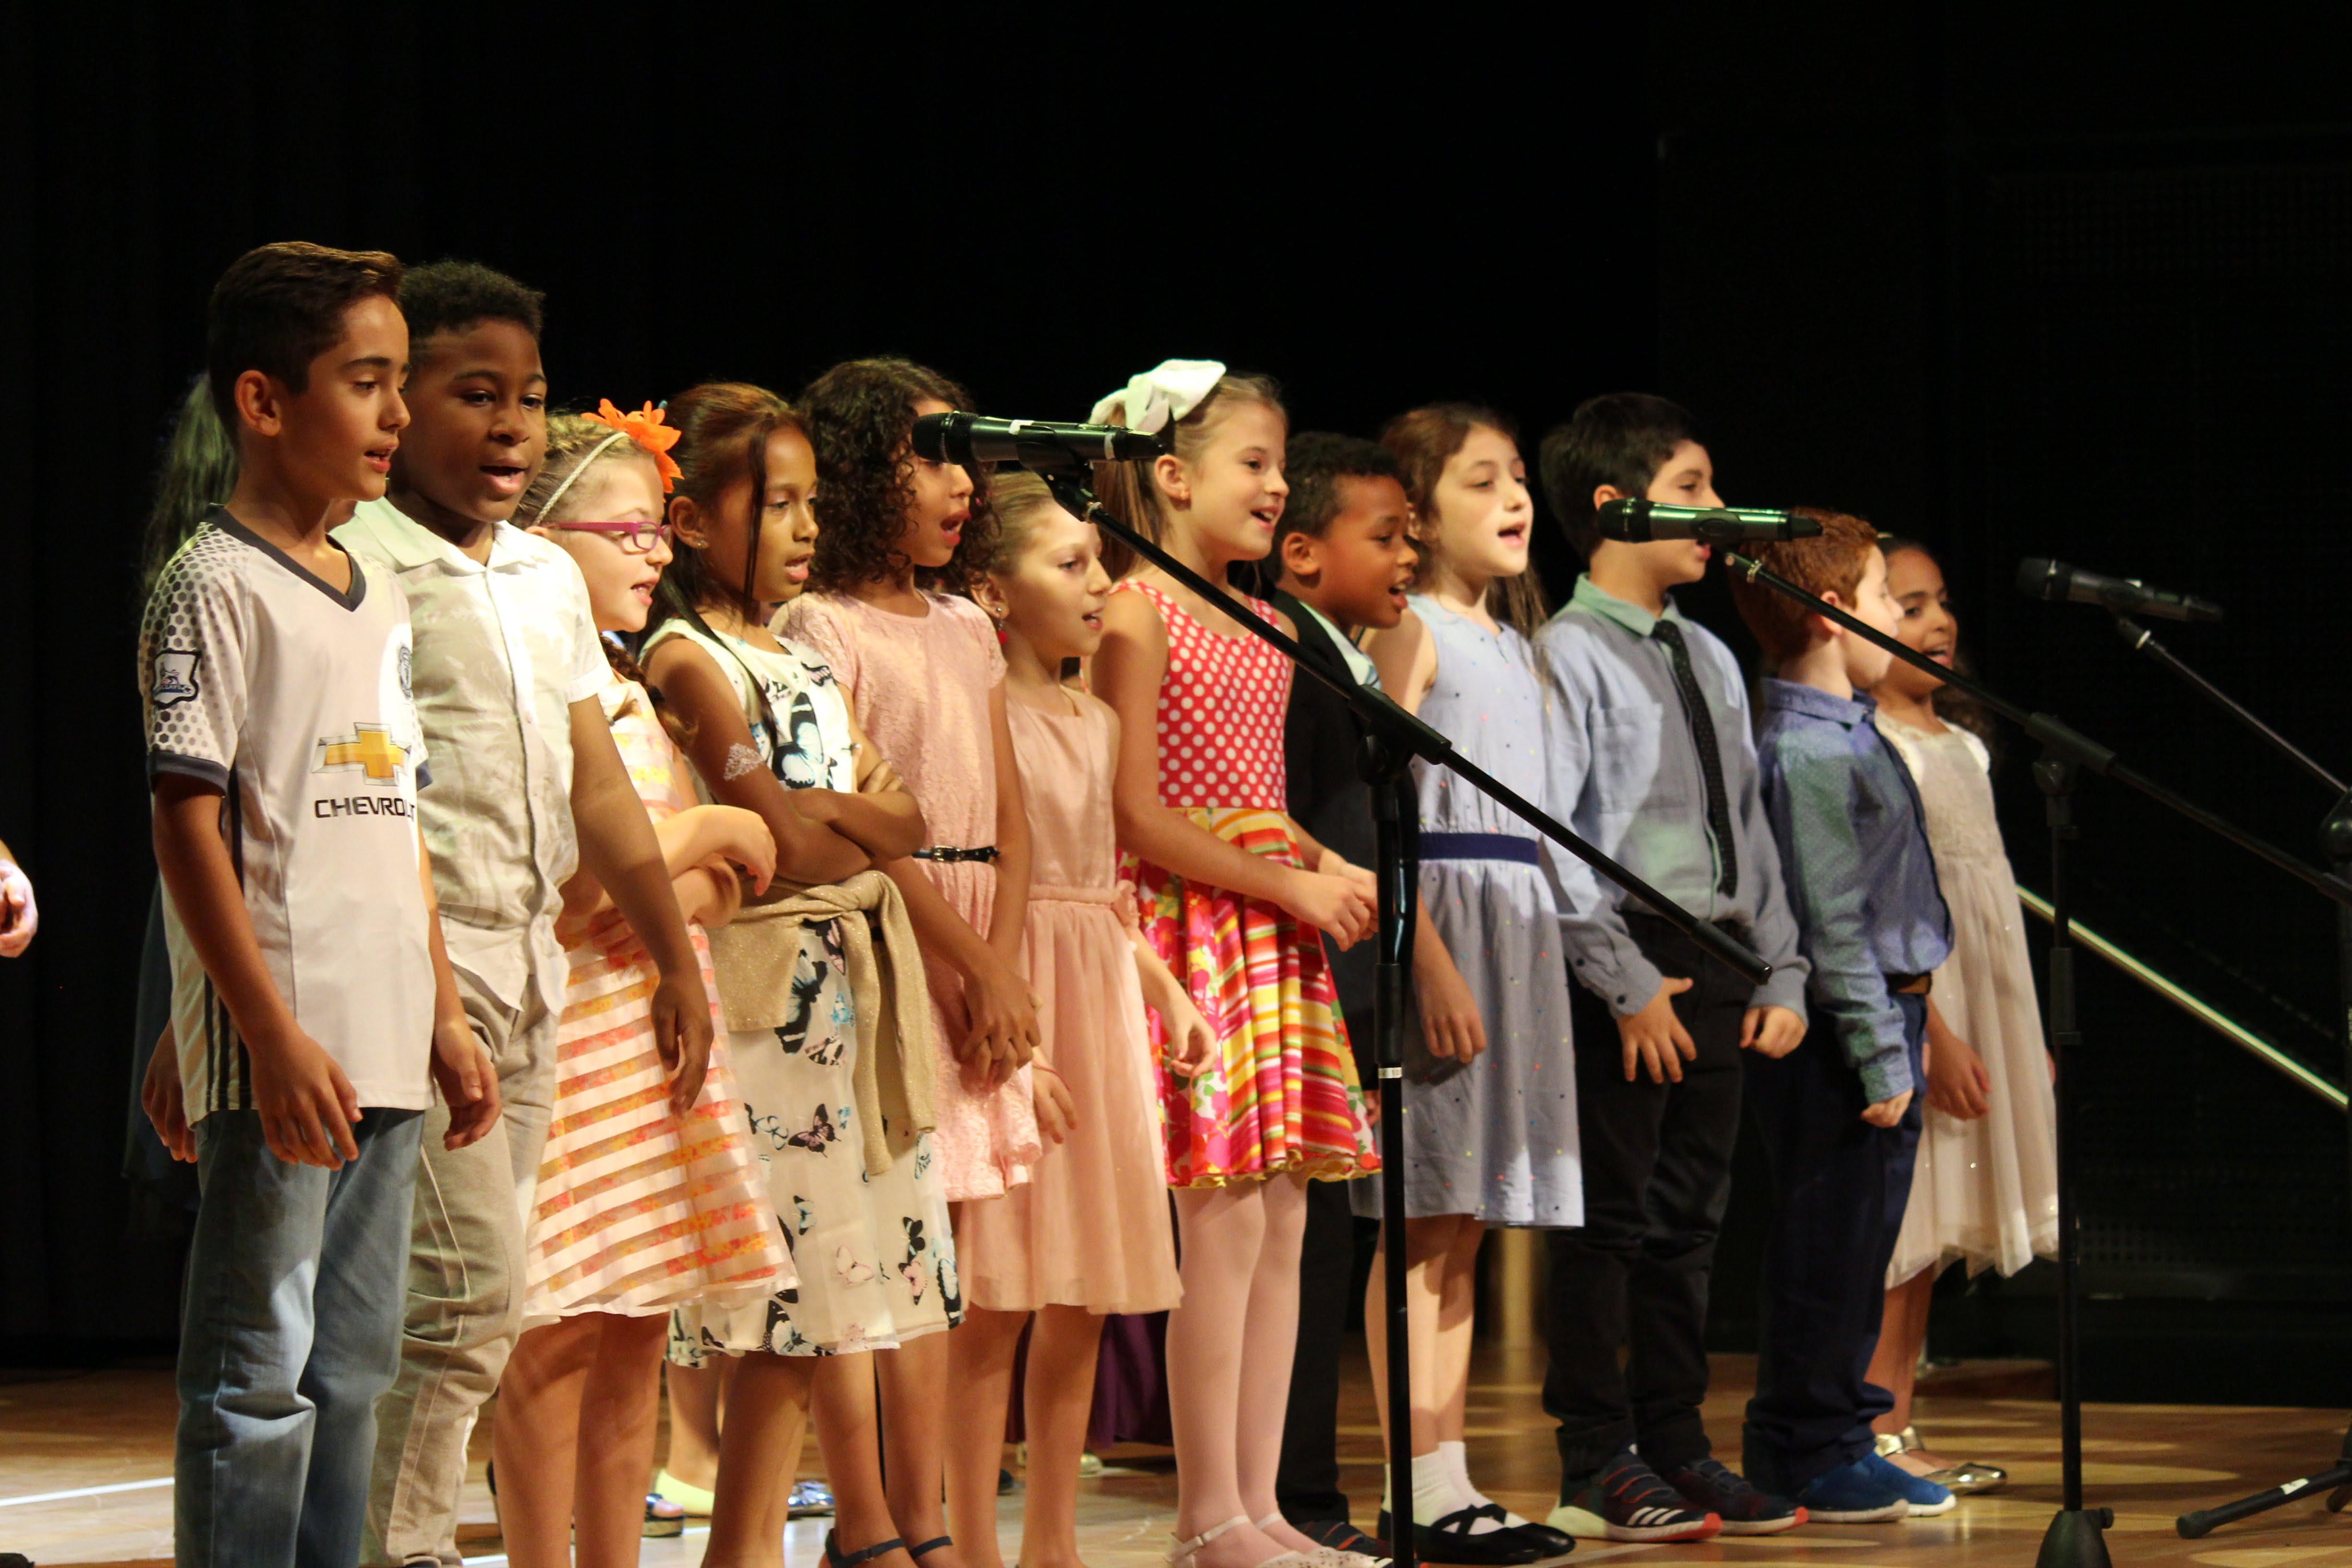 Blyth Academy Qatar students on stage